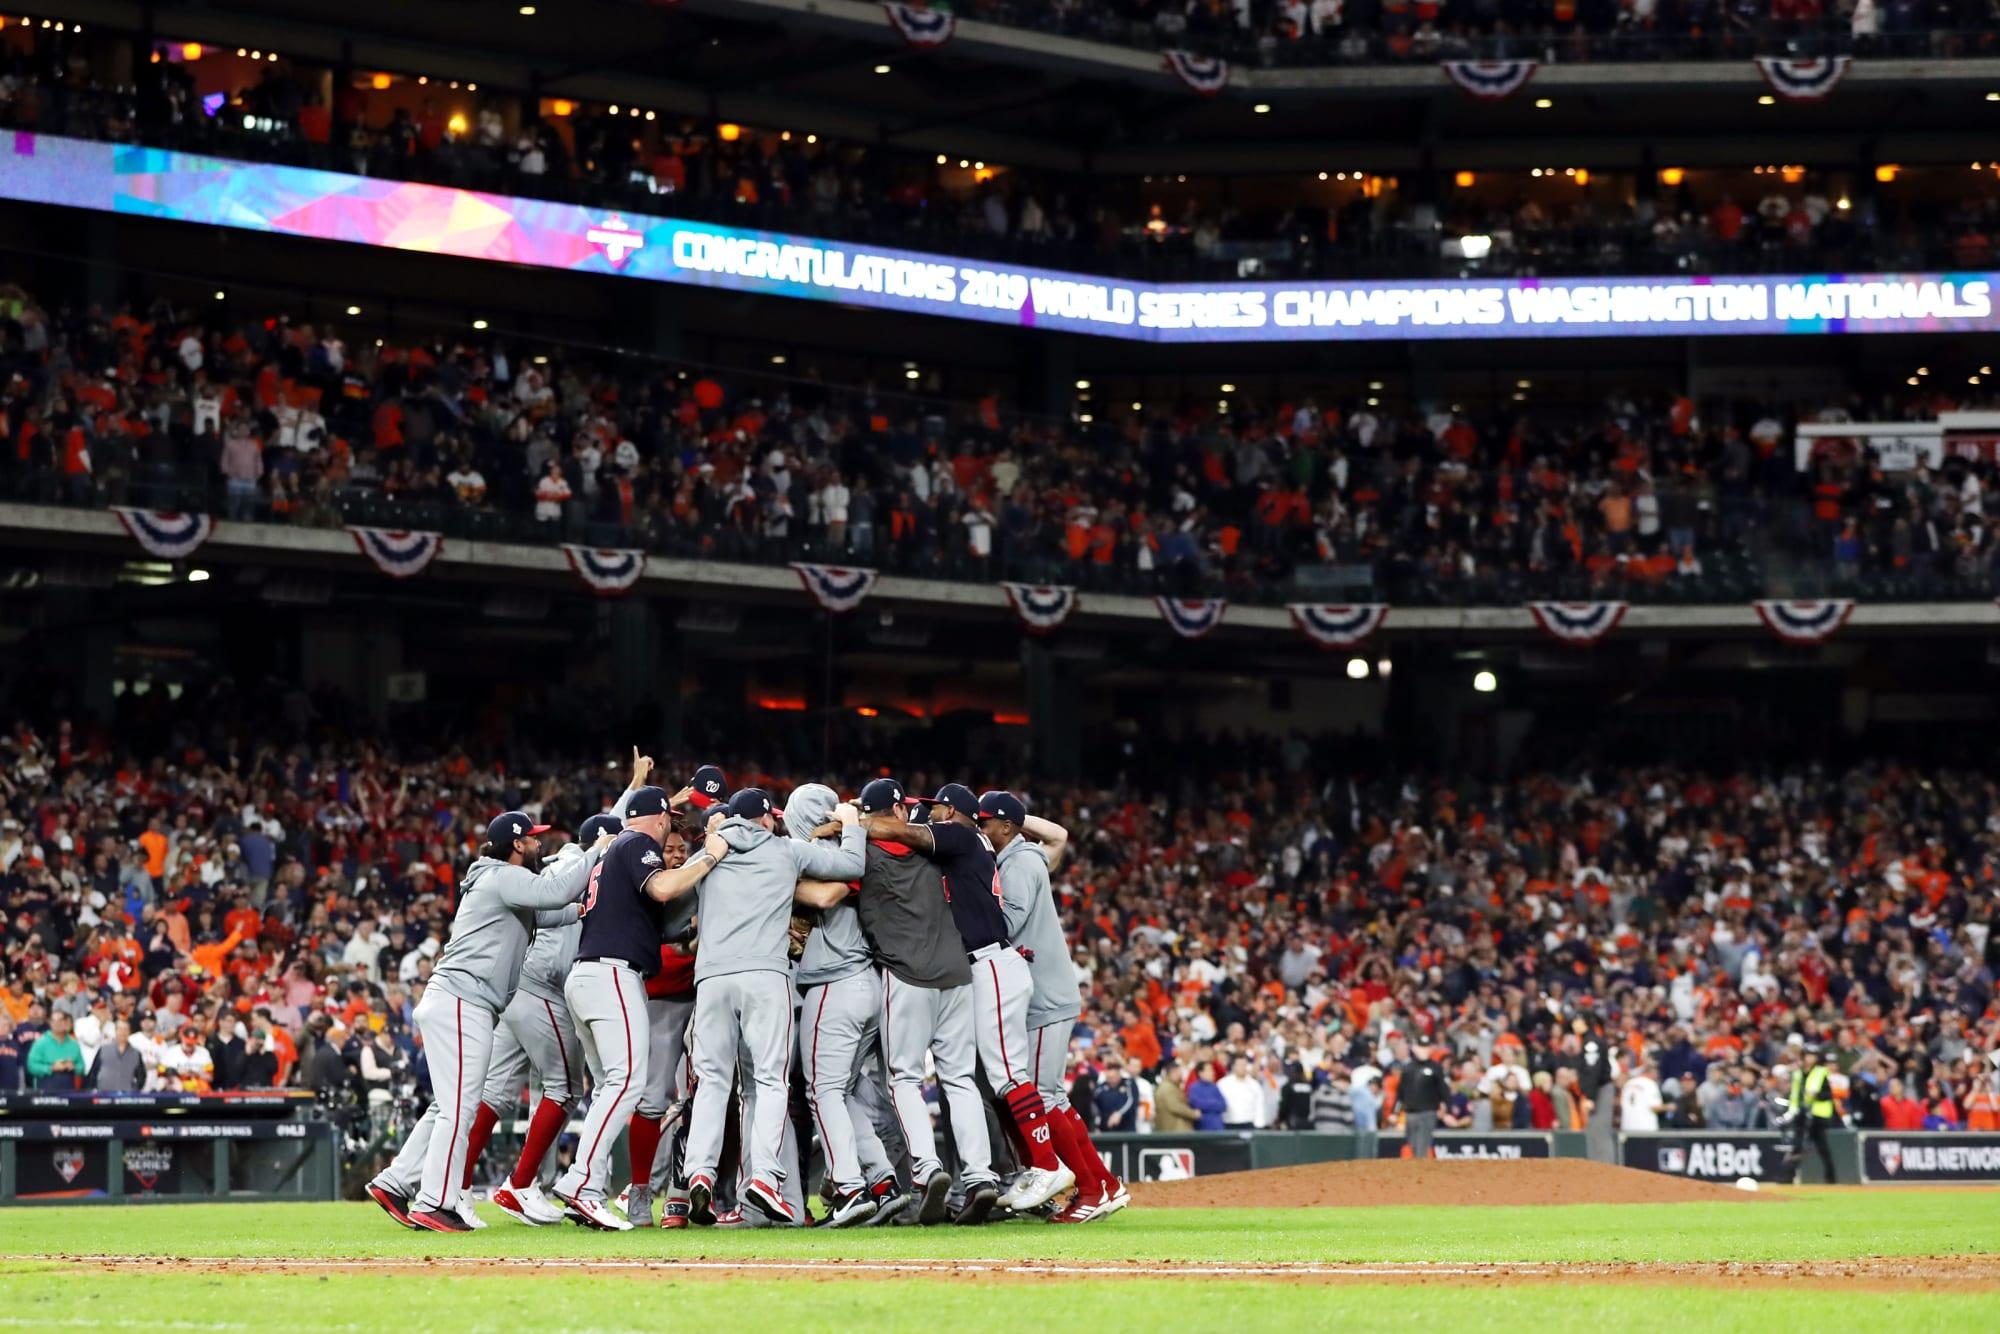 The MLB postseason TV schedule is finally set